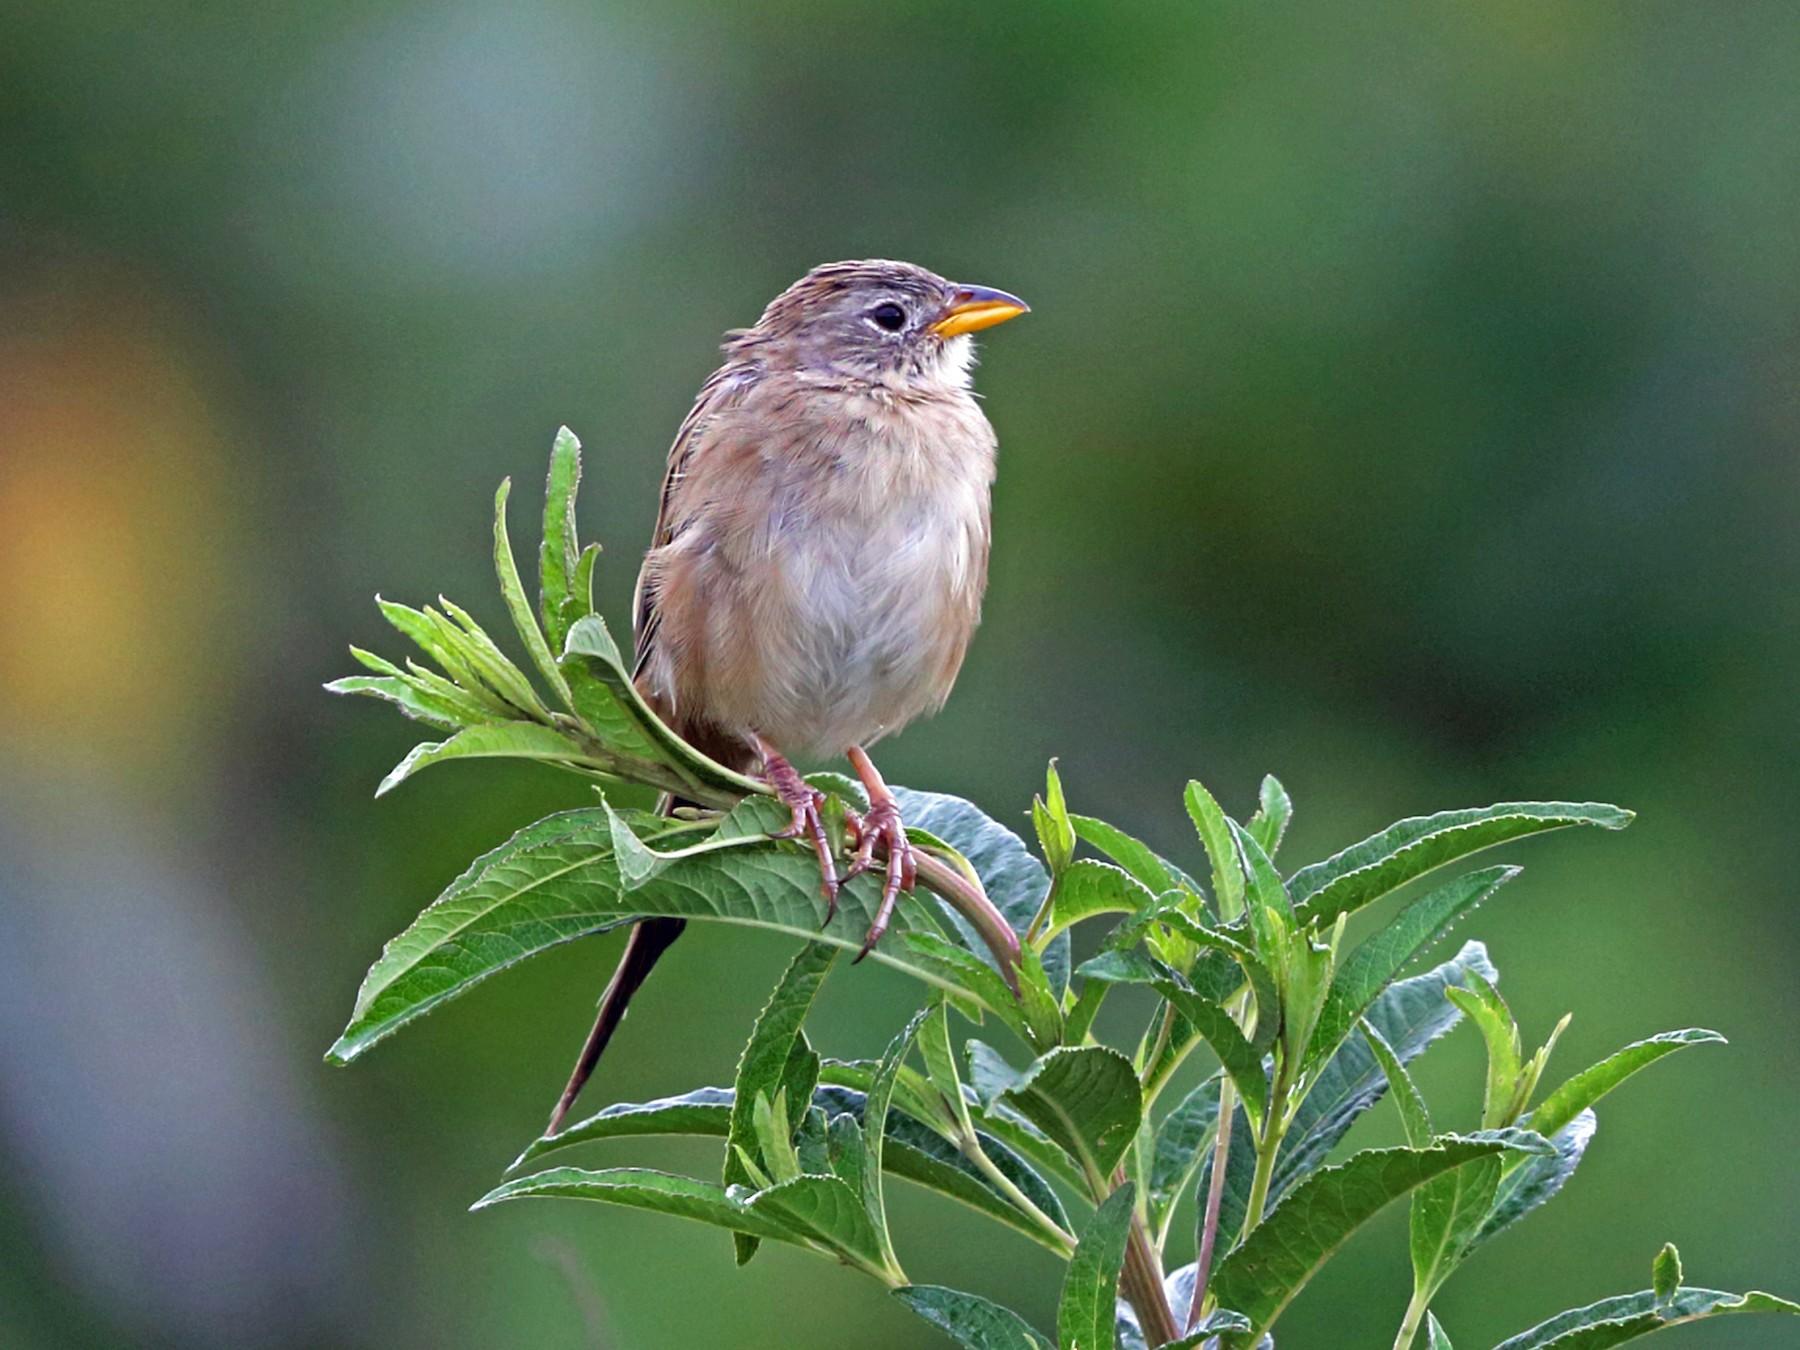 Wedge-tailed Grass-Finch - Nigel Voaden